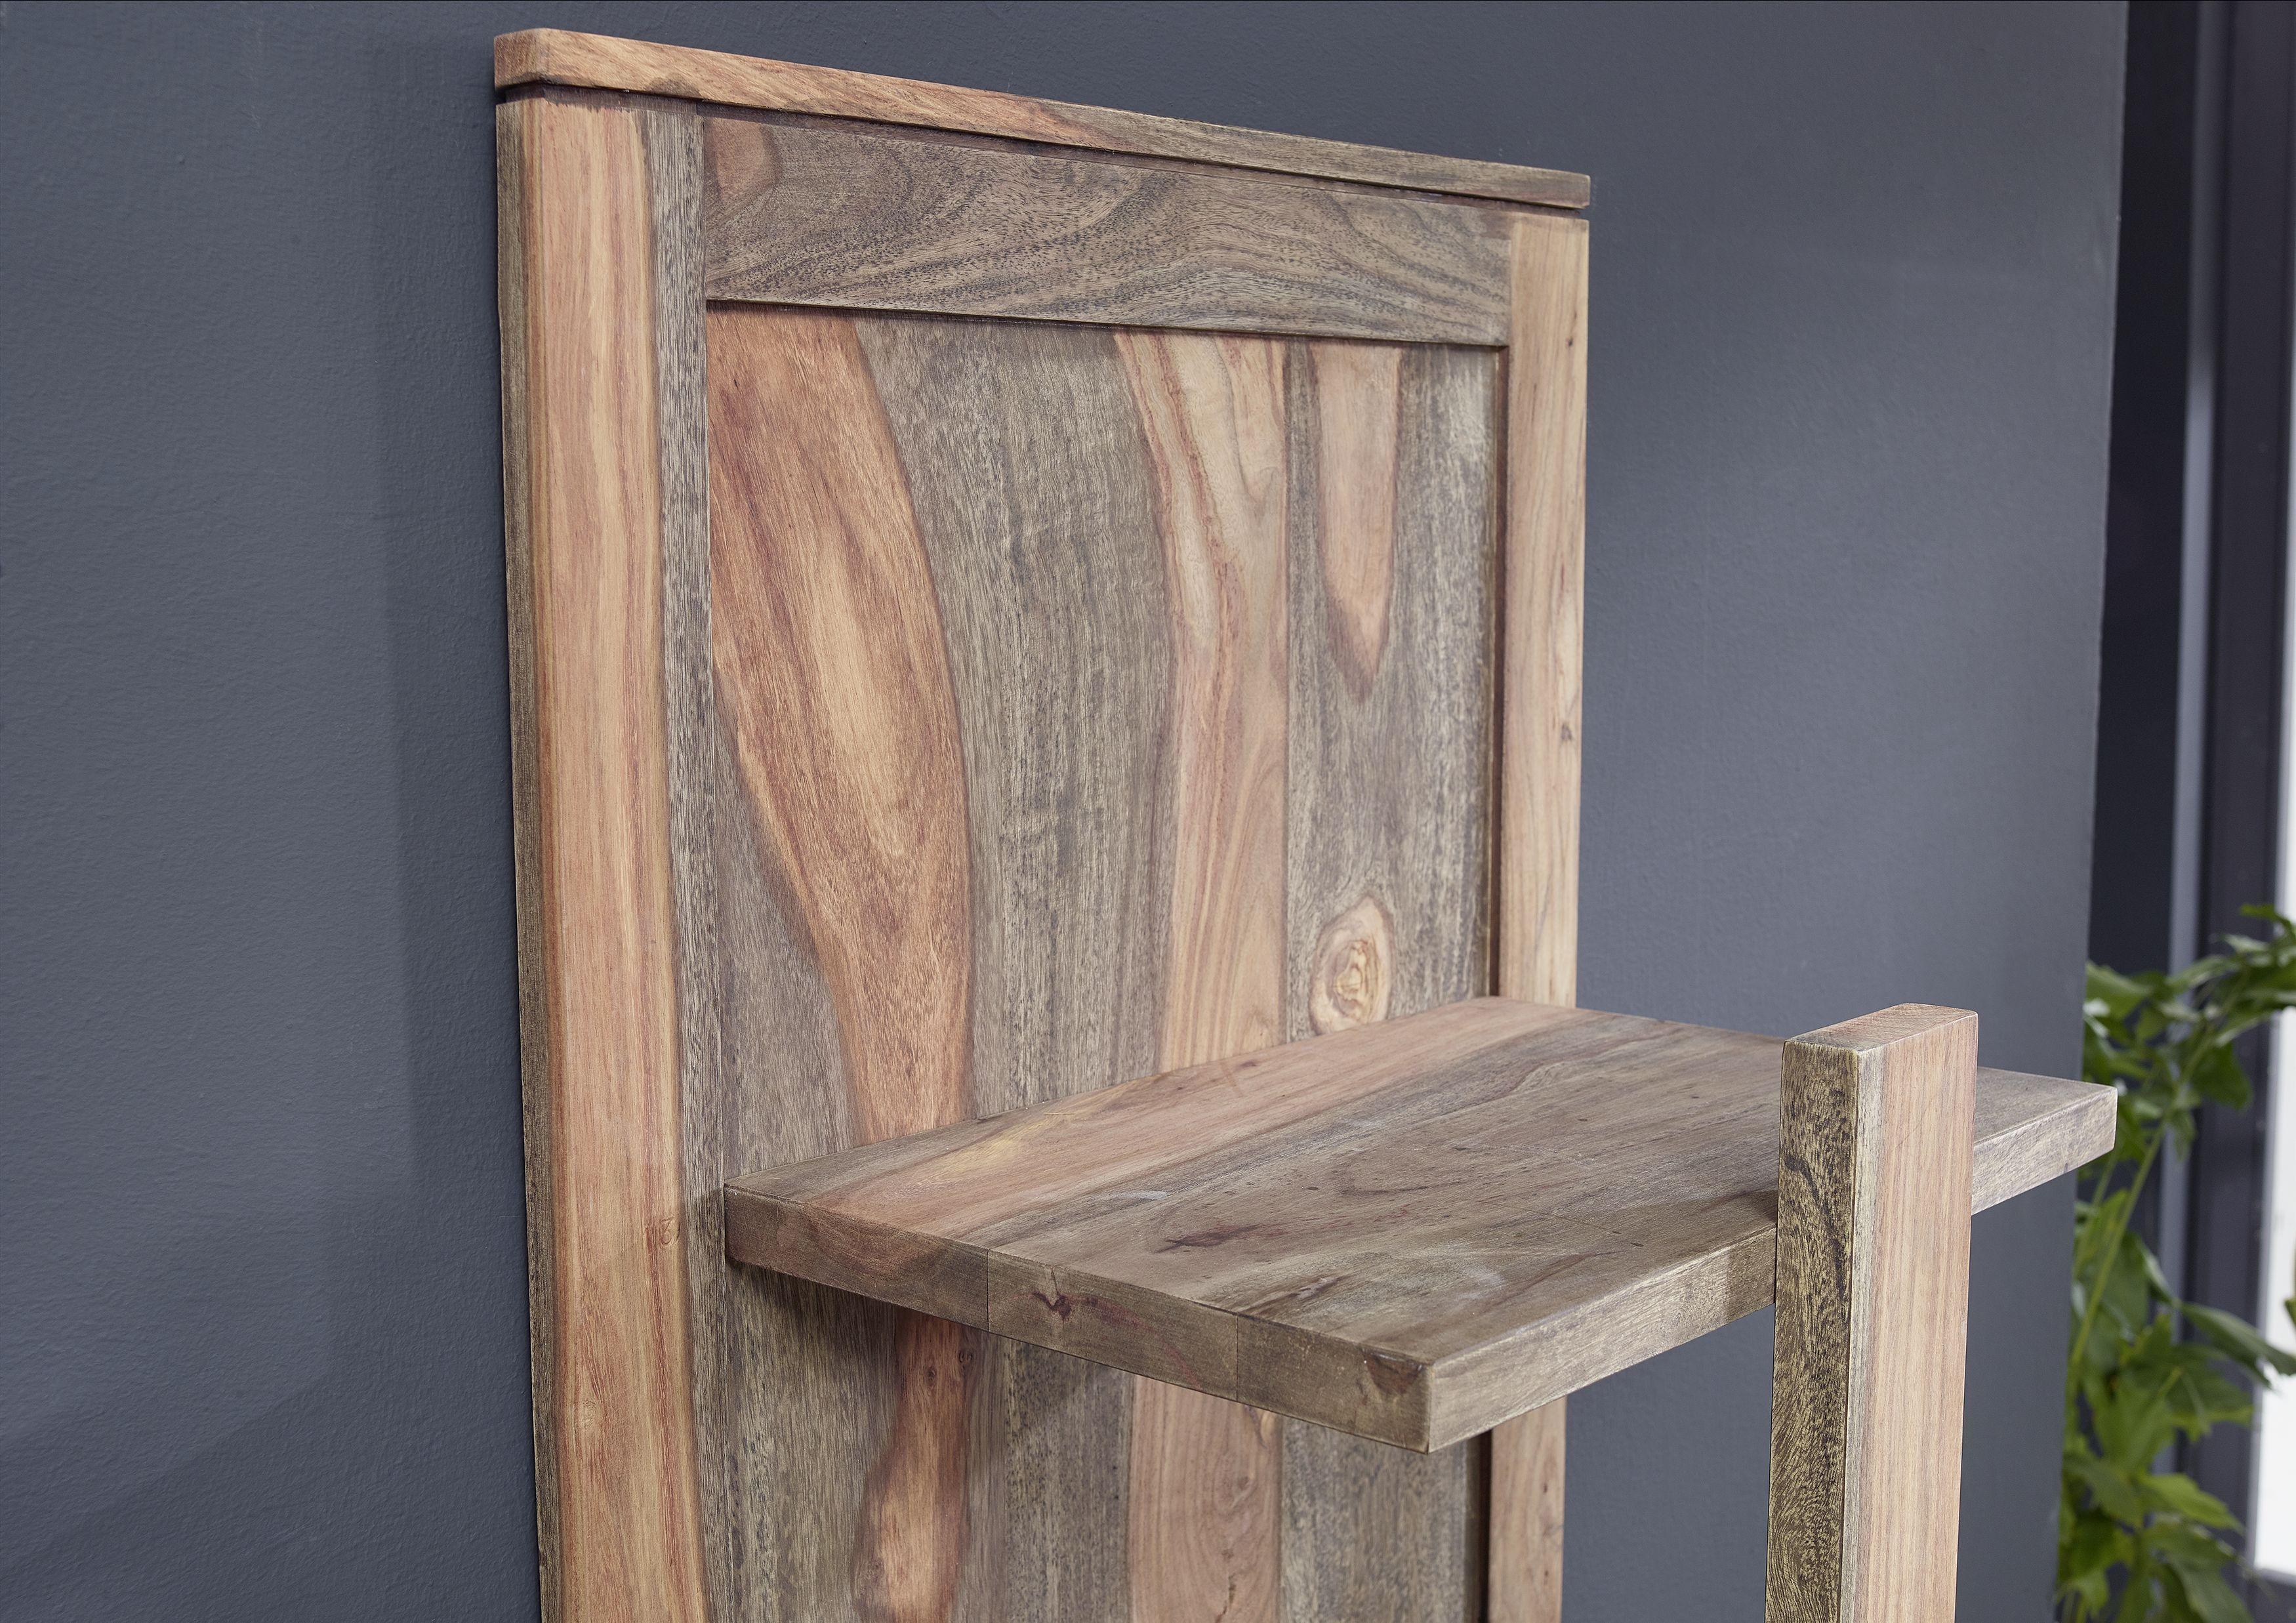 Hervorragend Klassische Sheesham Möbel grau geölt NATURE GREY | Möbel - Serie PD27